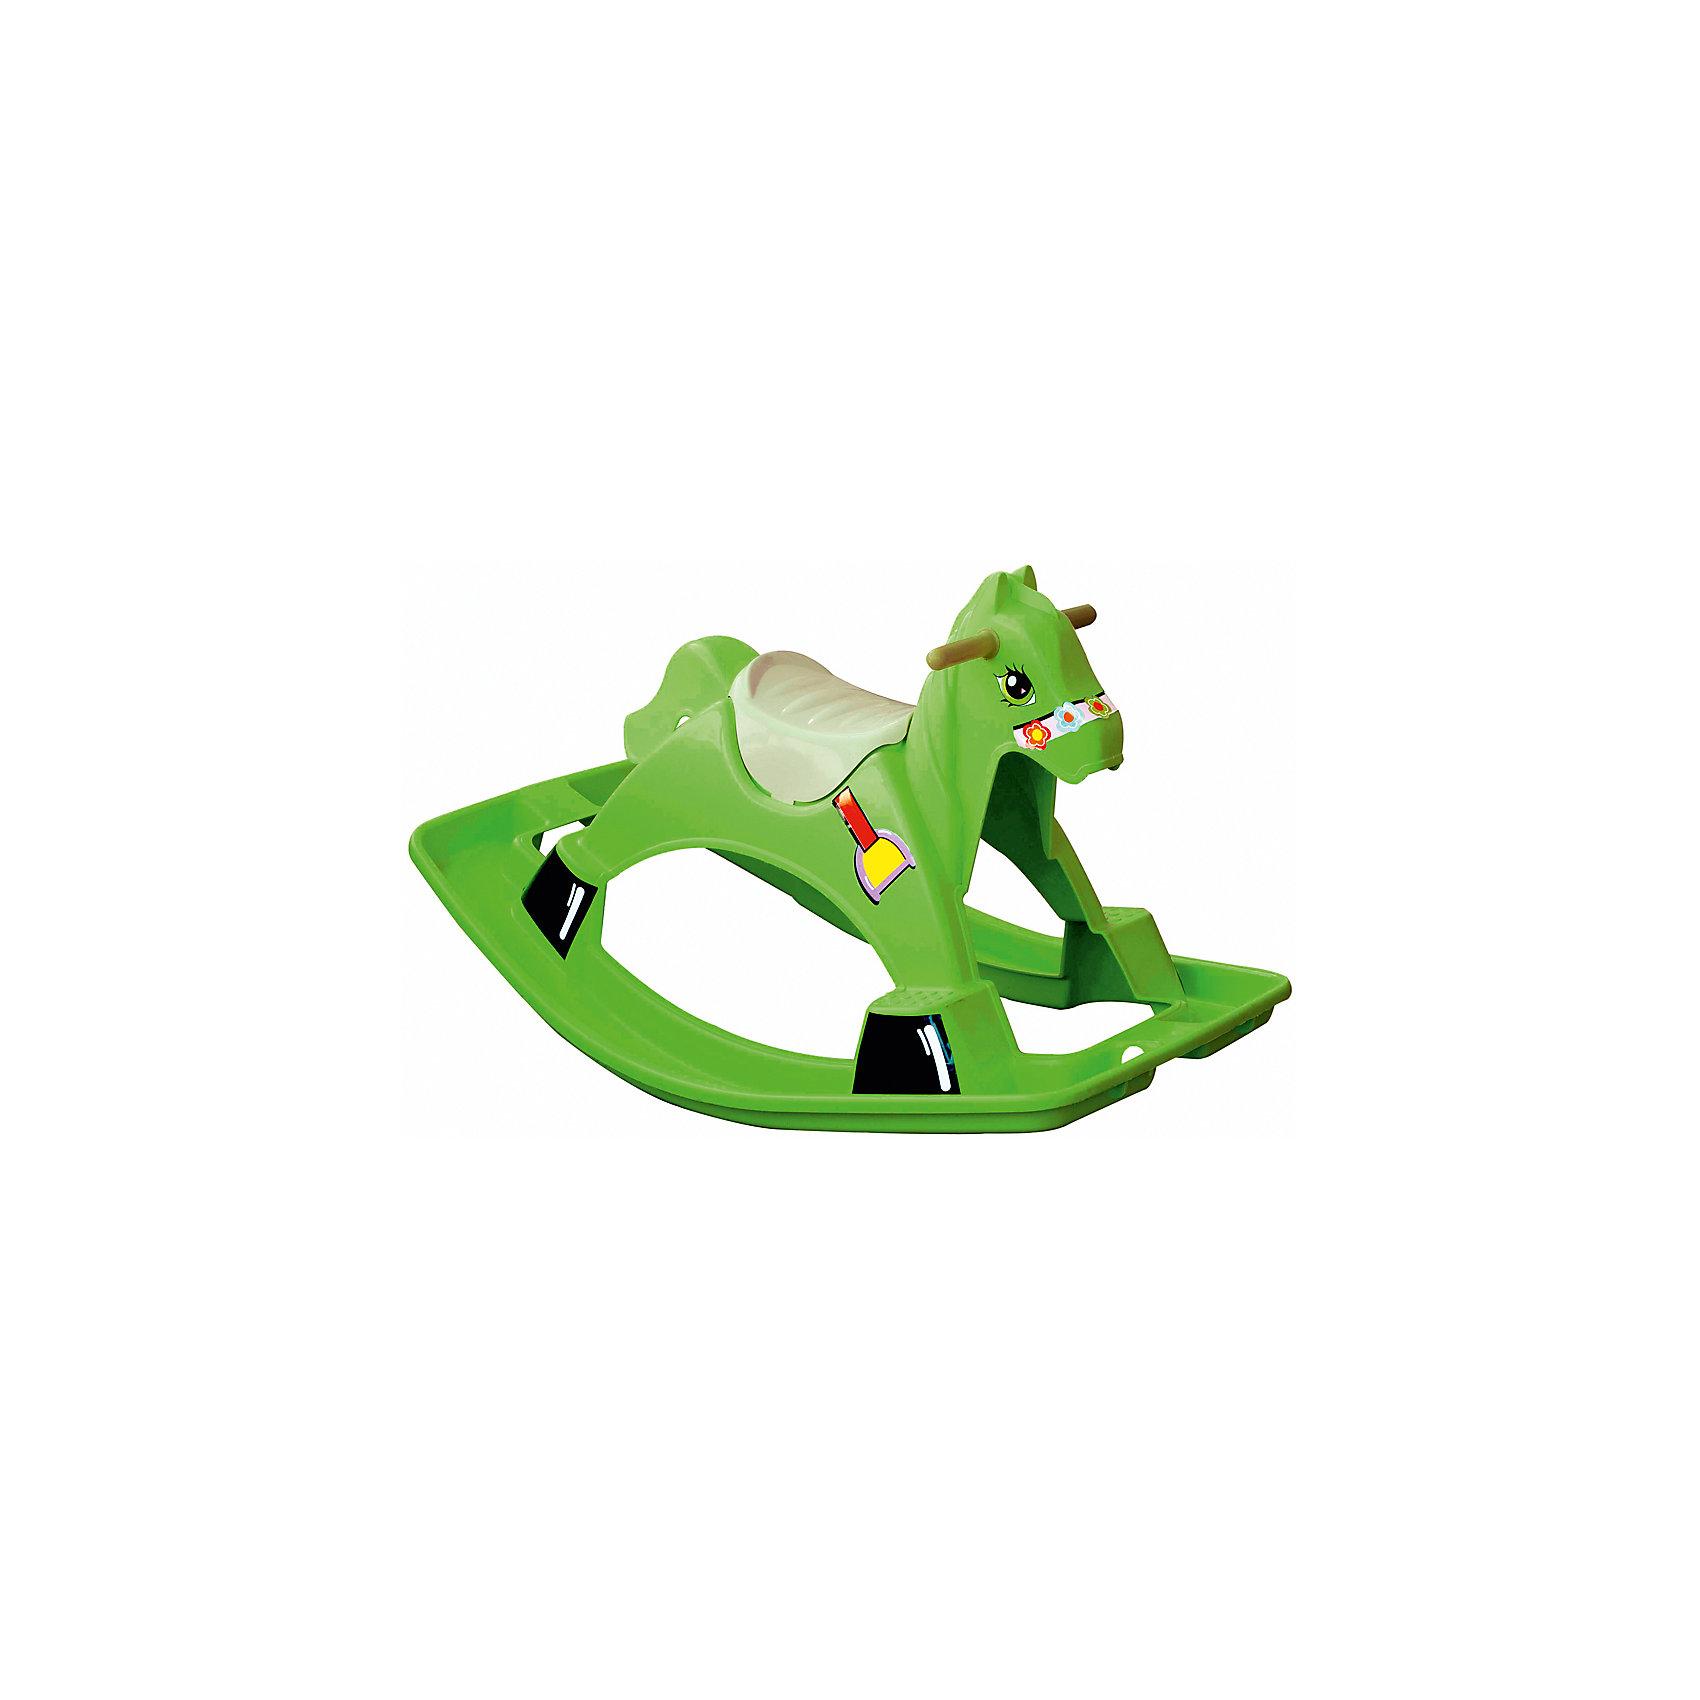 Качалка - Лошадка, Marianplast, зеленая